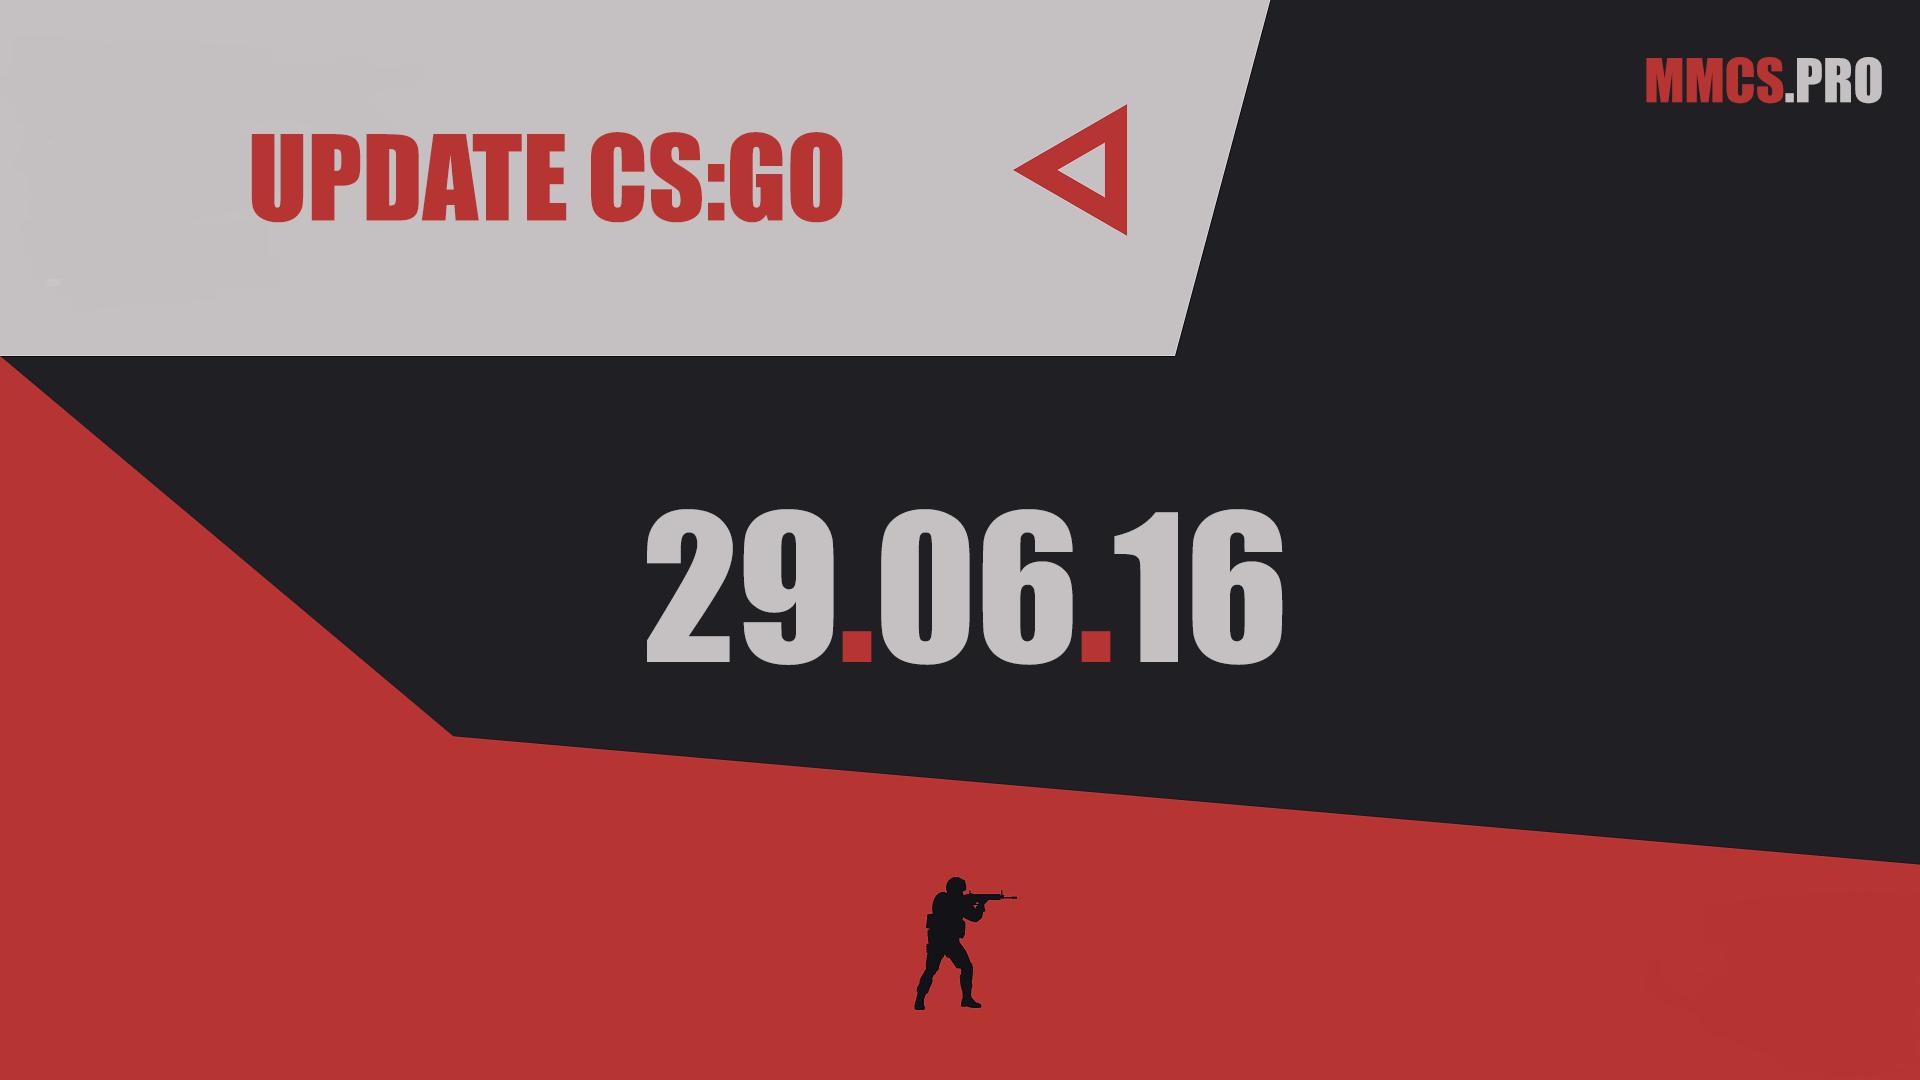 https://mmcs.pro/update-csgo-29-06-2016-valve/